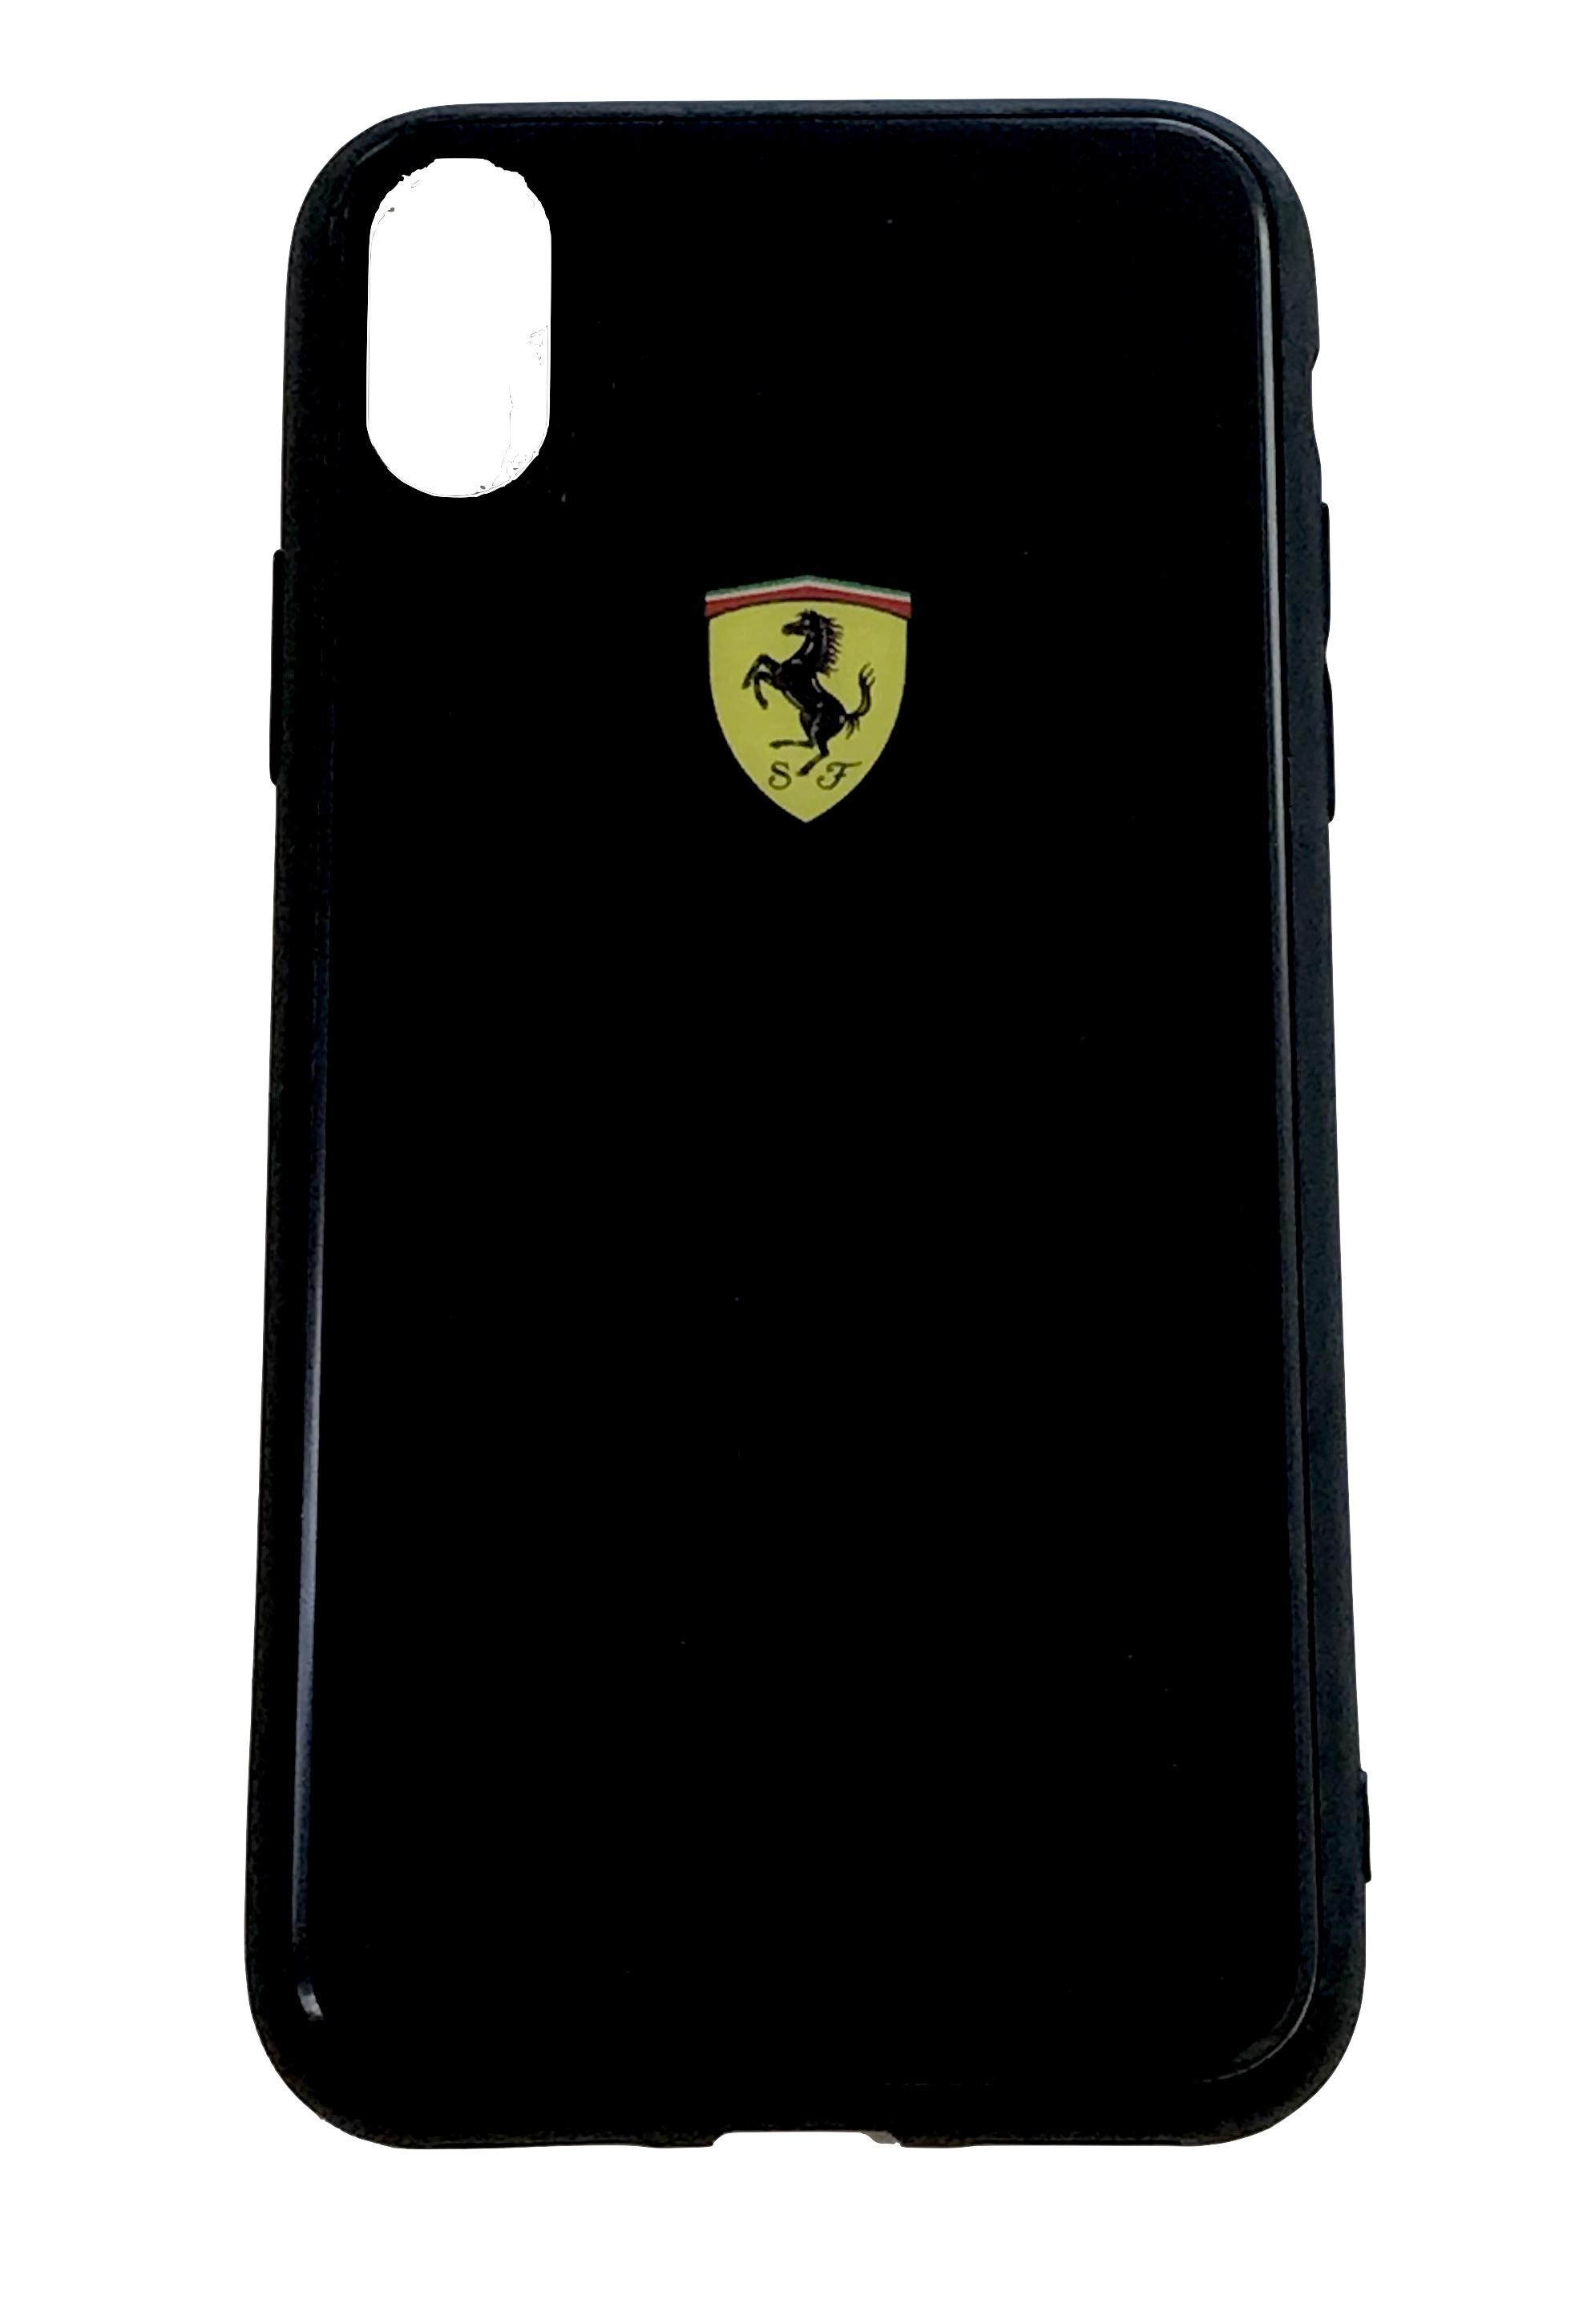 Ferrari Black Hard Case iPhone X